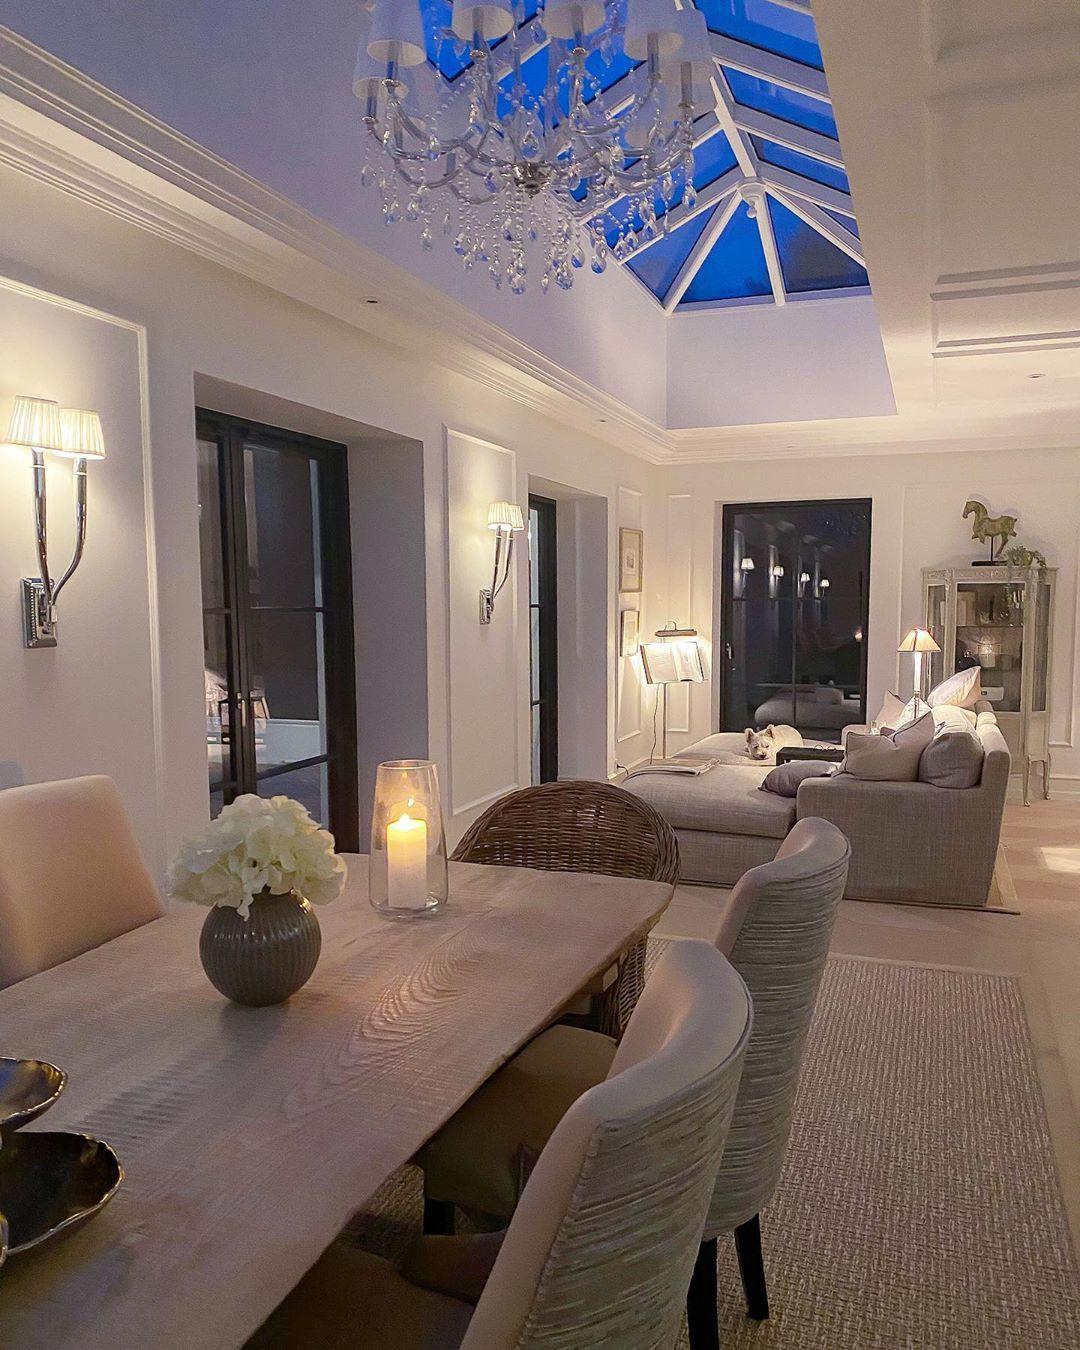 "Christina Palm Svaneeng Mertz on Instagram: ""Sweet dreams from Louis and I ✨🐶🥱 #SundayNight #havealovelyevening #InteriorDecor #Livingroom #InteriorDesign #Decor #LuxuryLiving…"""